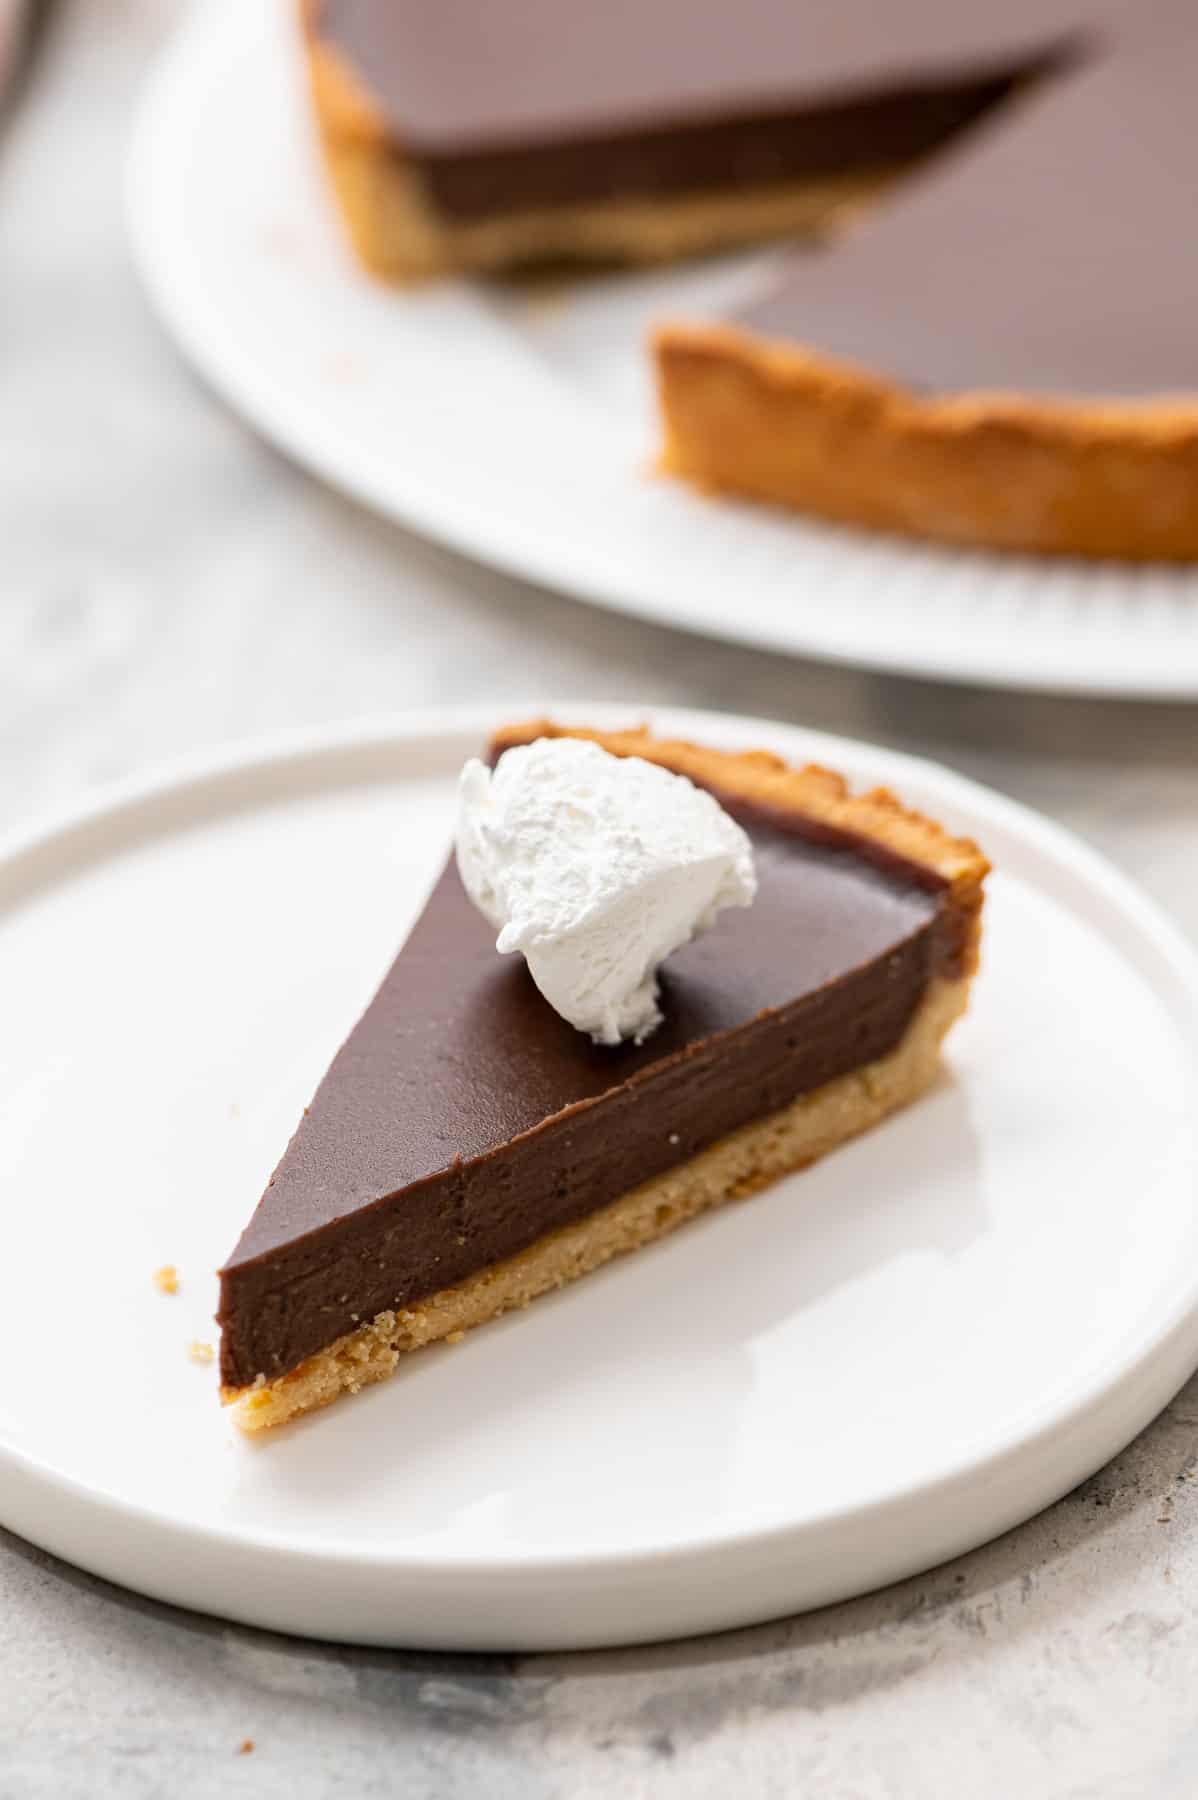 A slice of gluten-free chocolate tart.